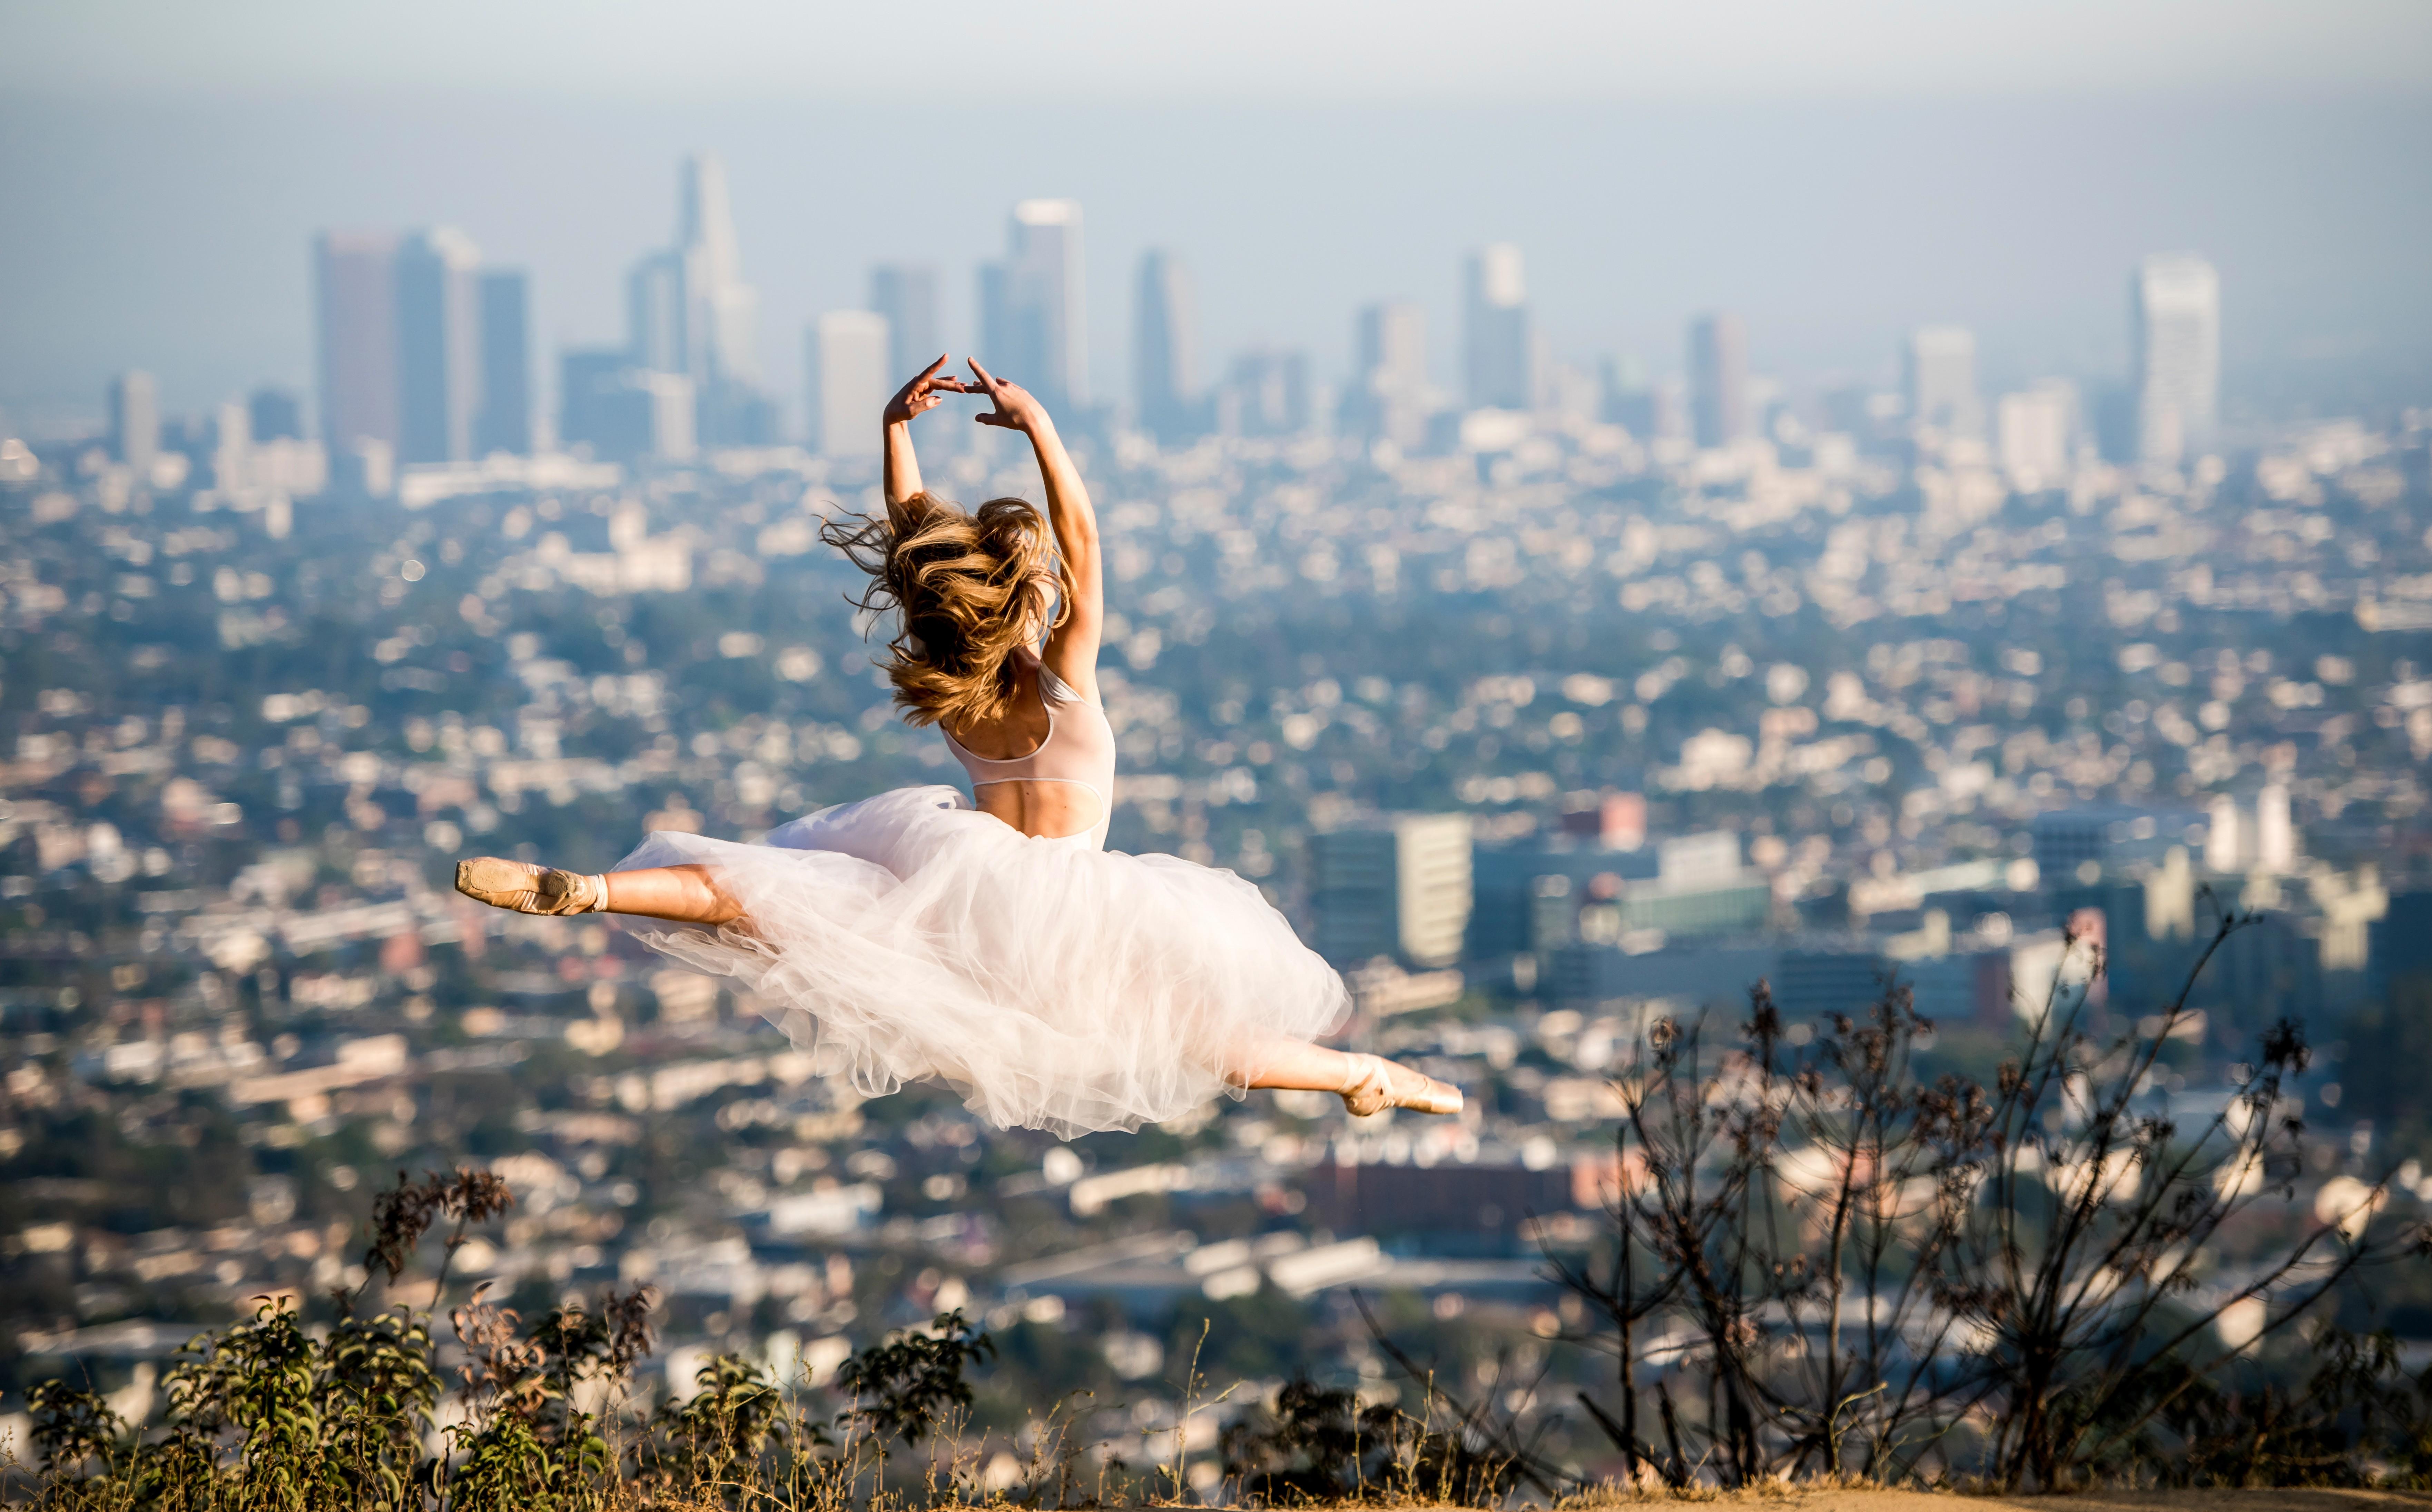 Ballet Dance Wallpapers Hd Dodskypict: Ballerina Wallpapers High Quality